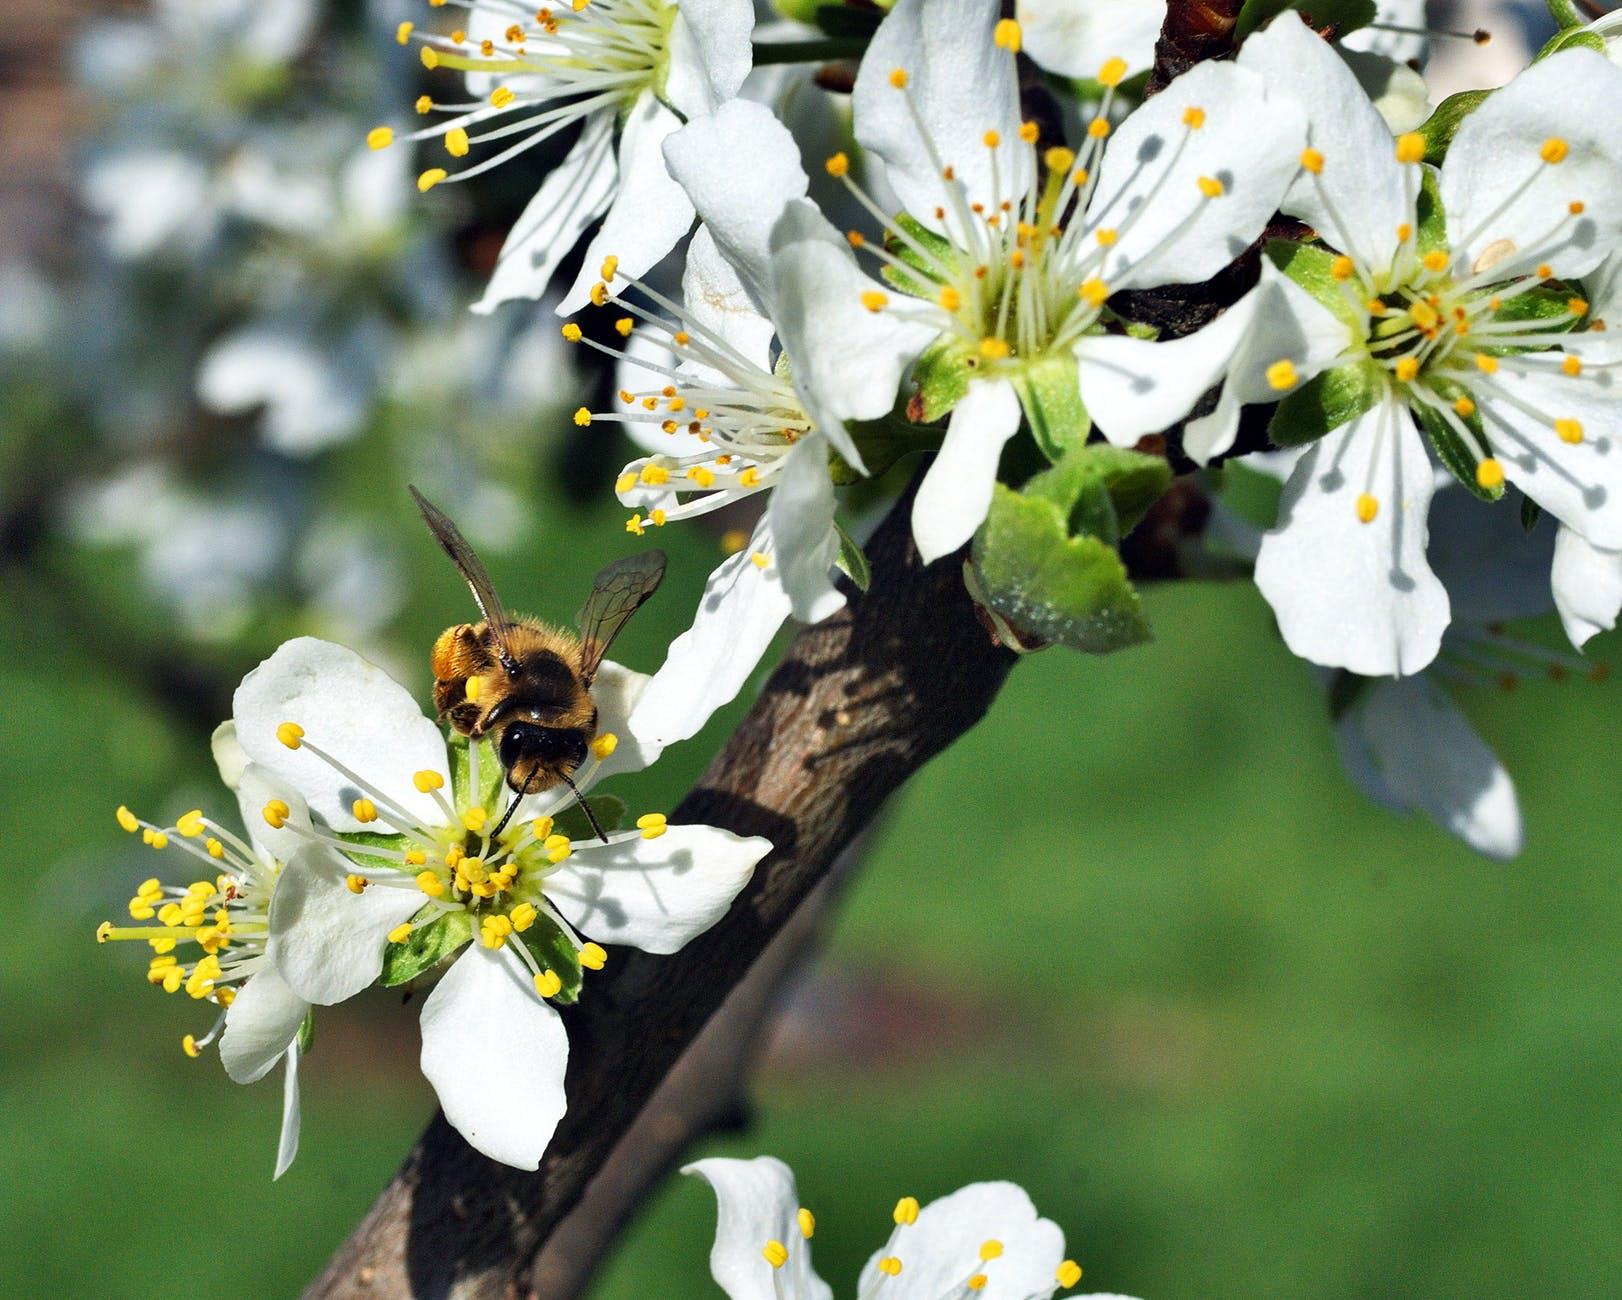 bee-pollination-flower-plum-162623.jpeg